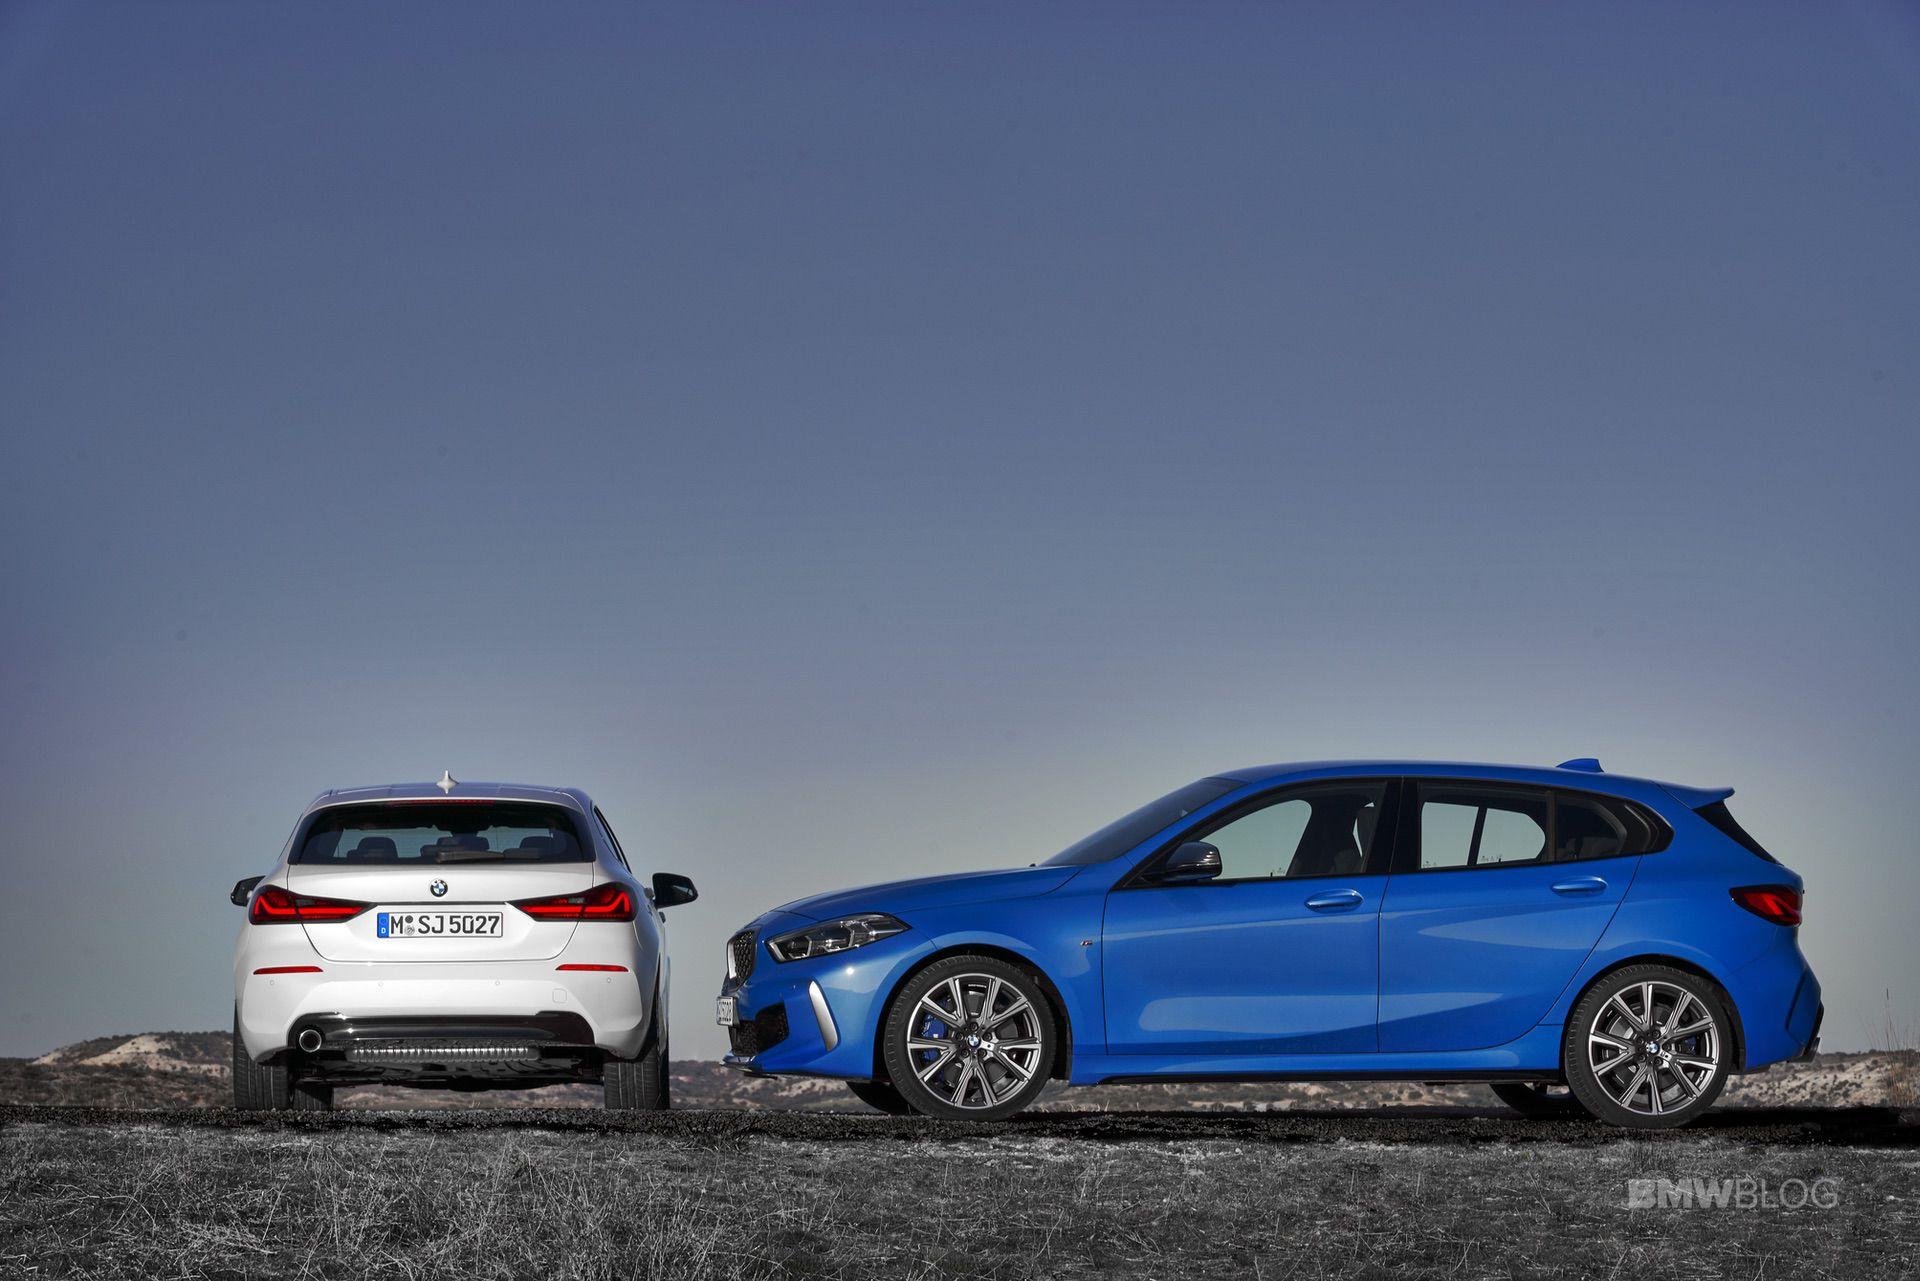 new-2019-BMW-1-Series-photos-03.jpg